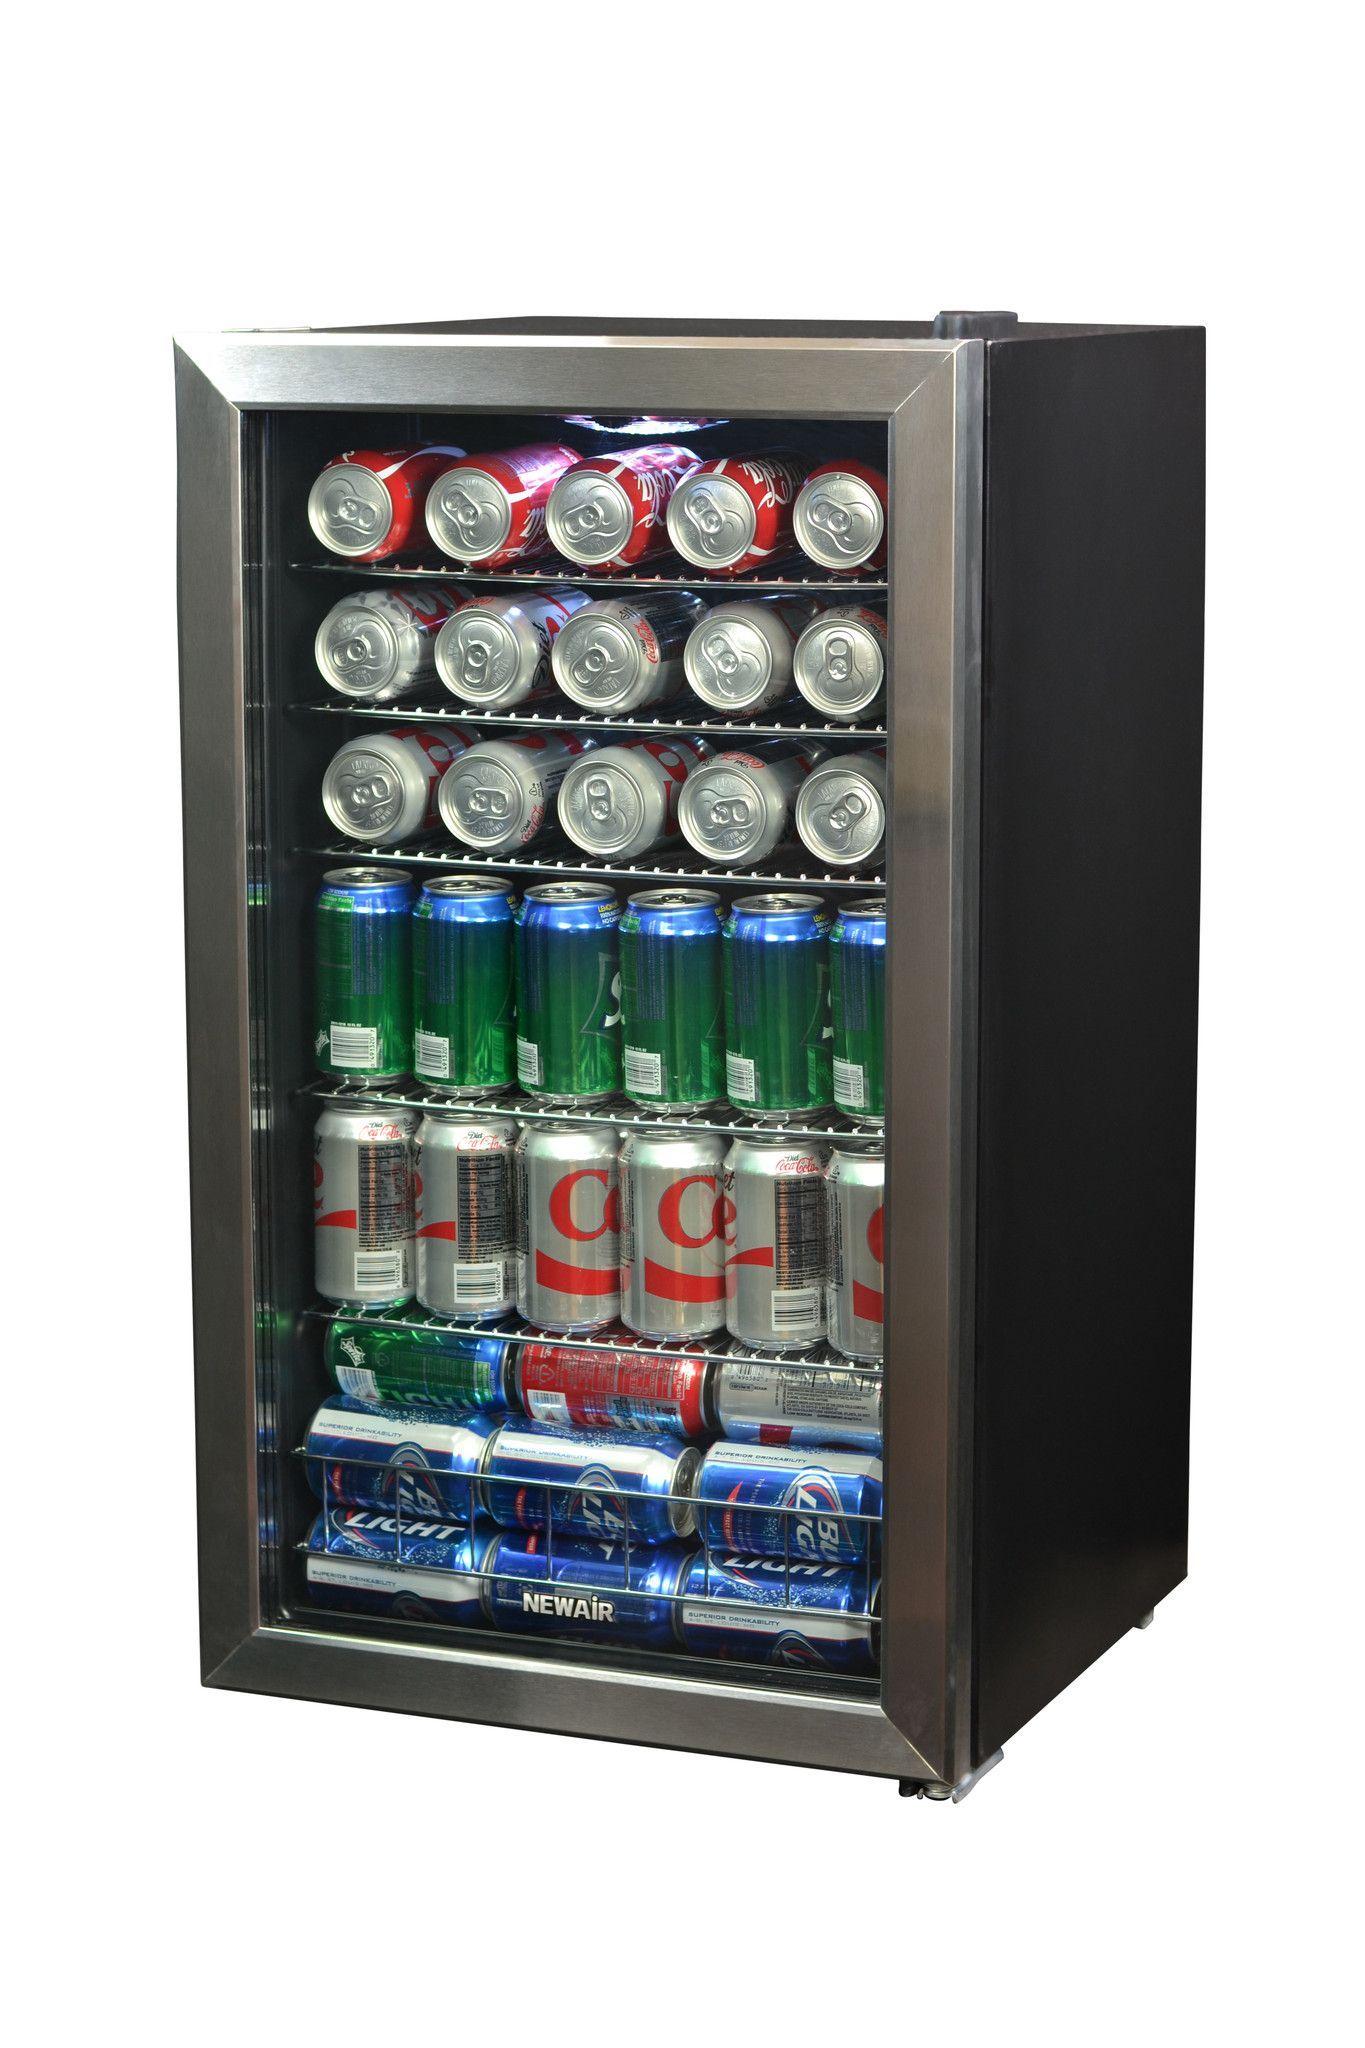 NewAir AB1200 126 Can Beverage Cooler Beverage